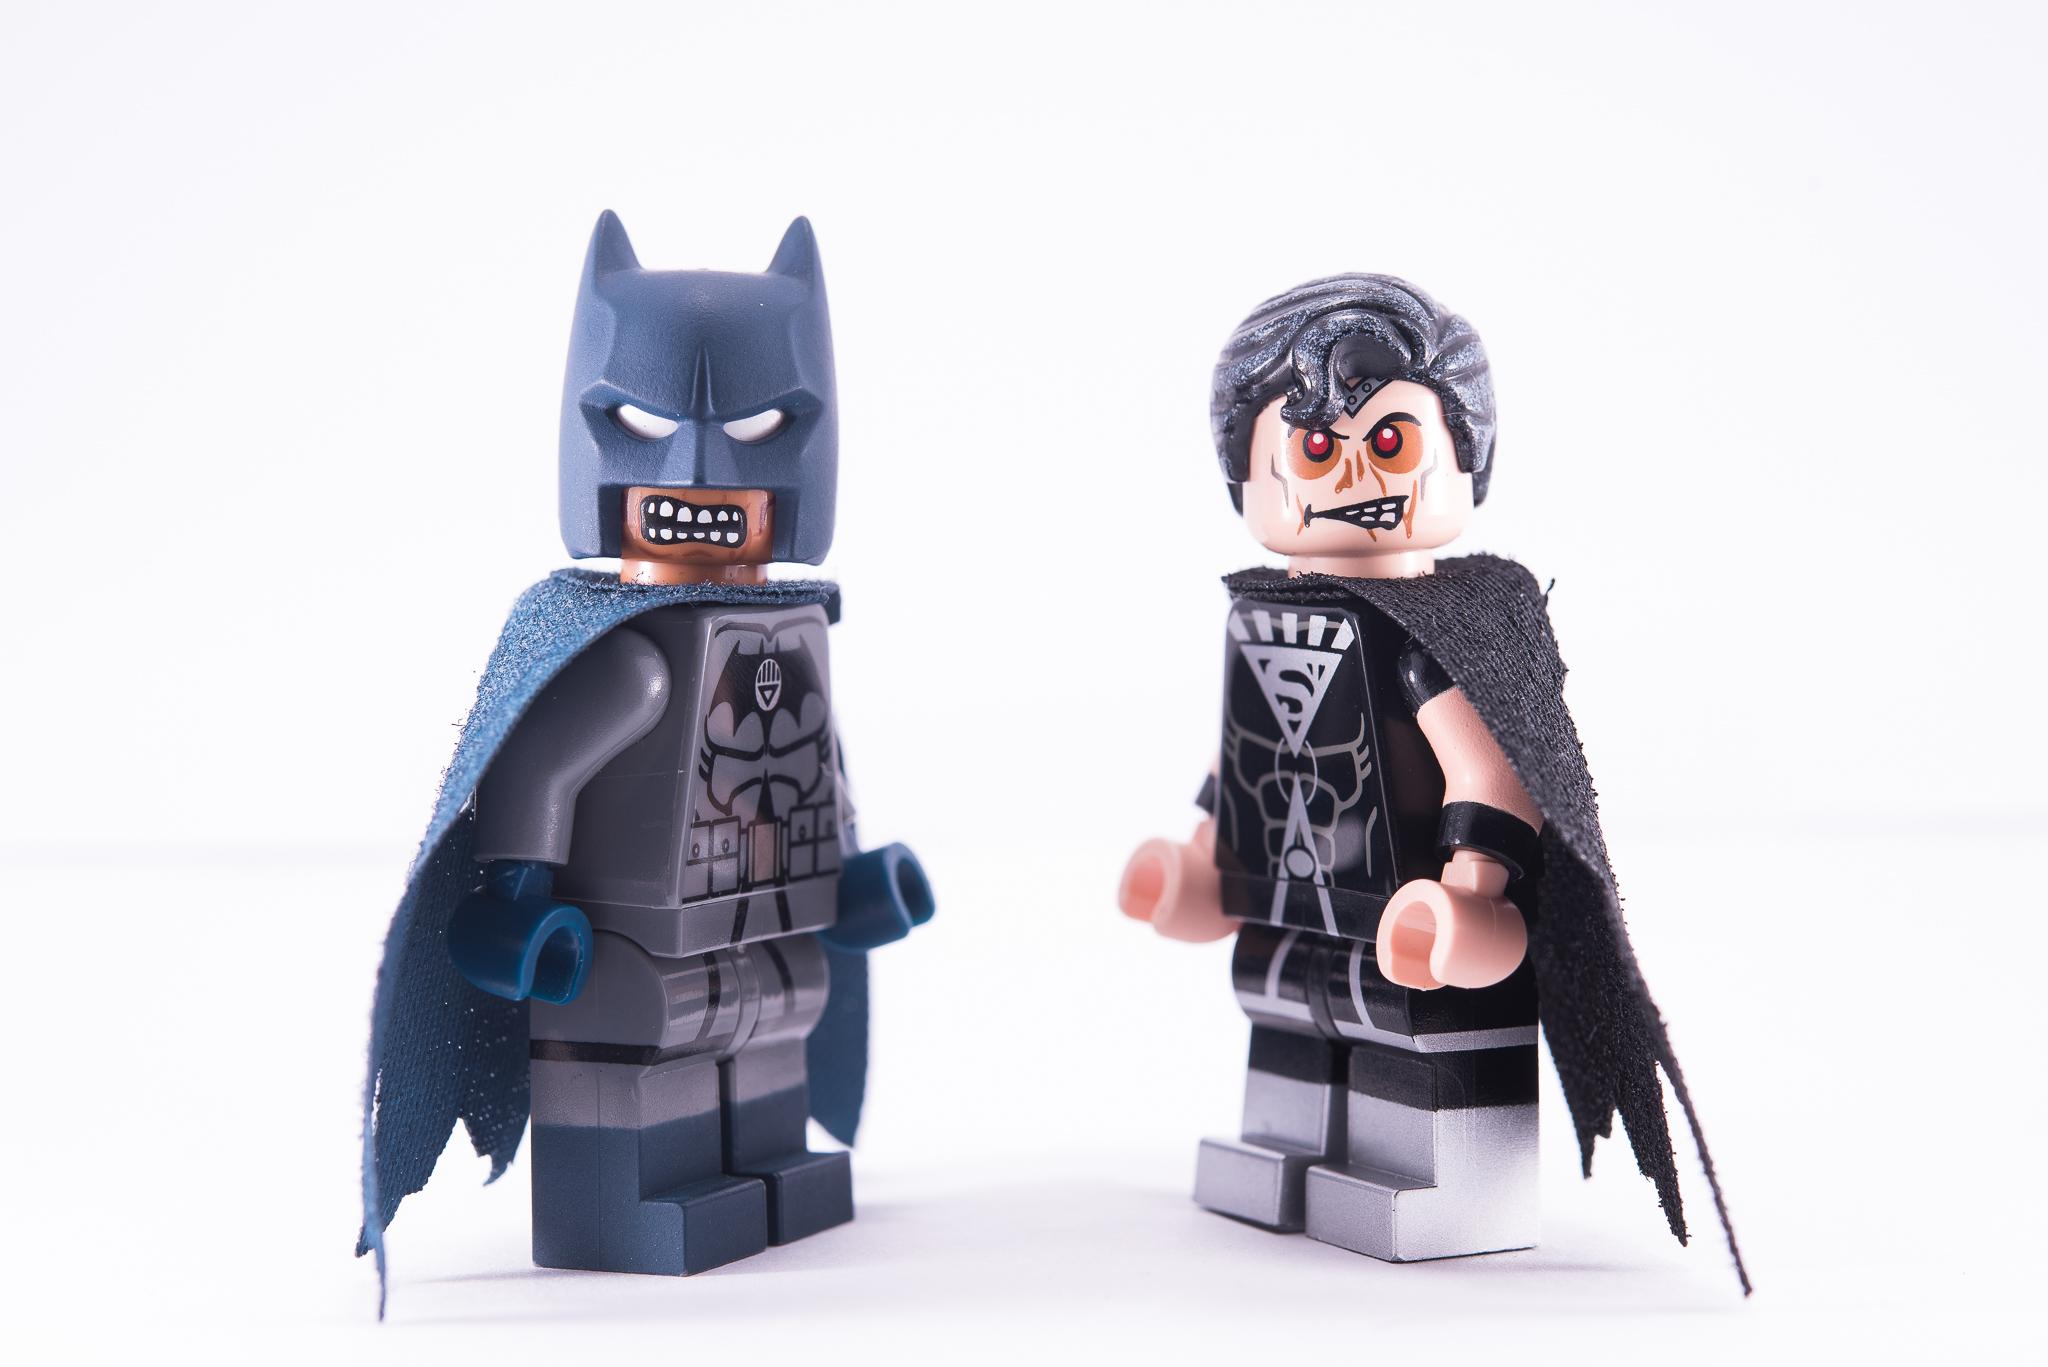 Undead Steel and Undead Knight Custom Minifigures